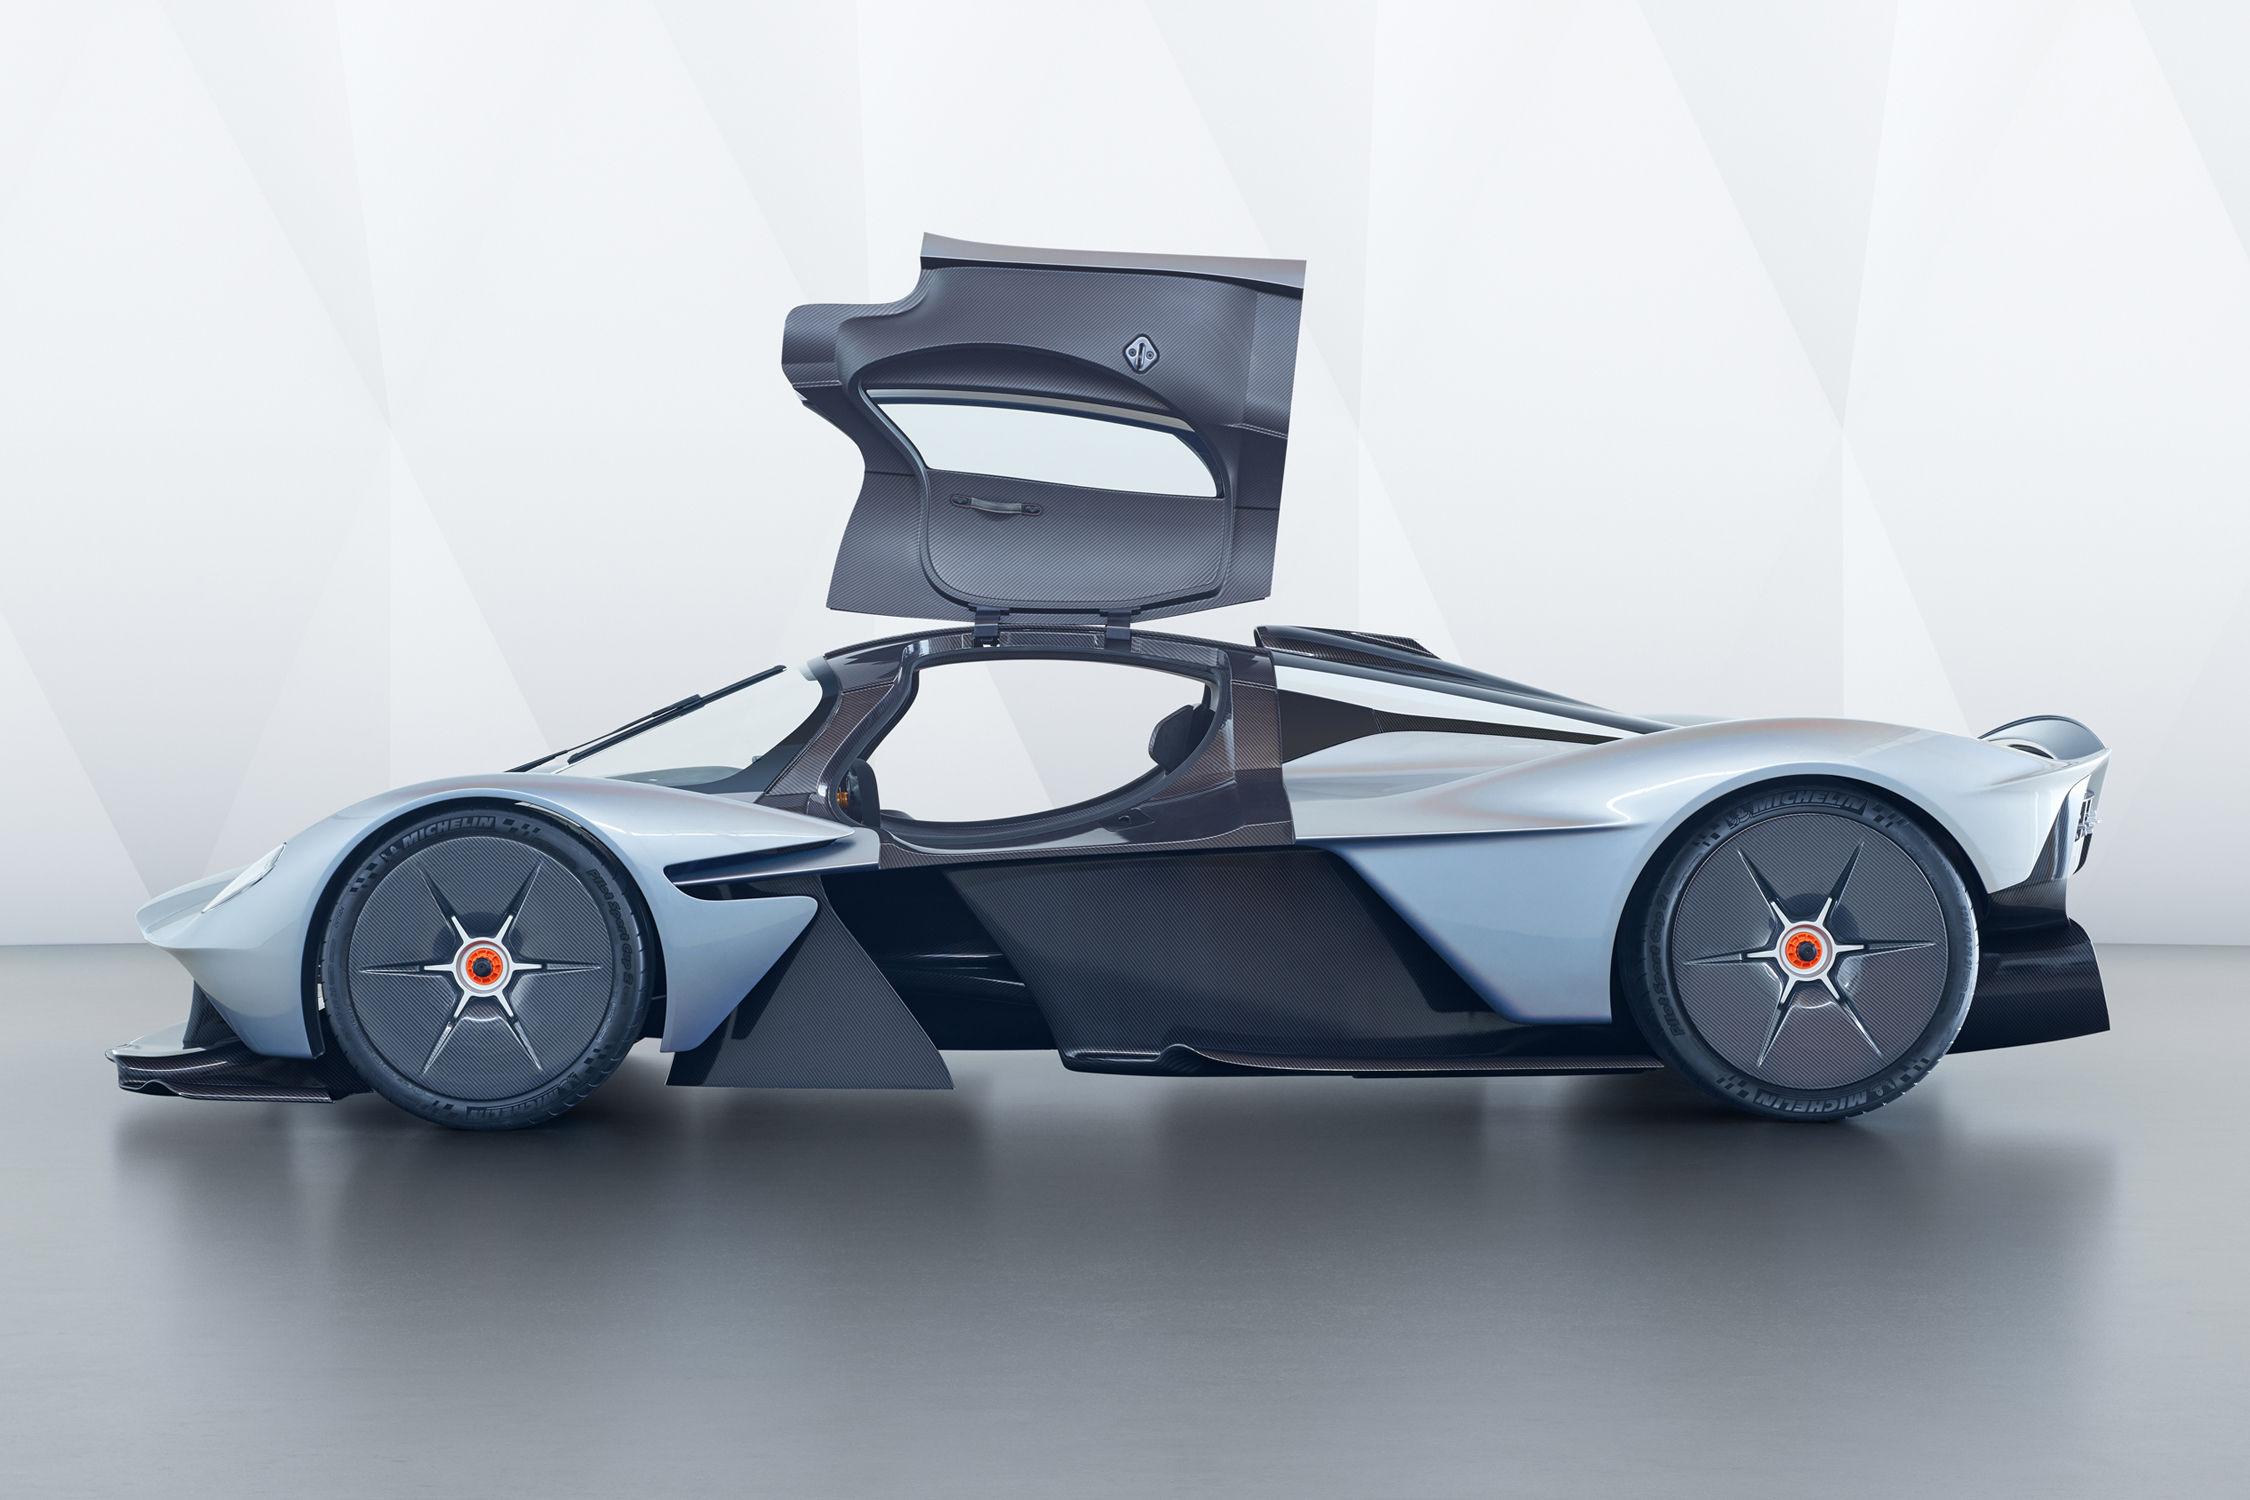 L'Aston Martin Valkyrie (2019) aura une suite